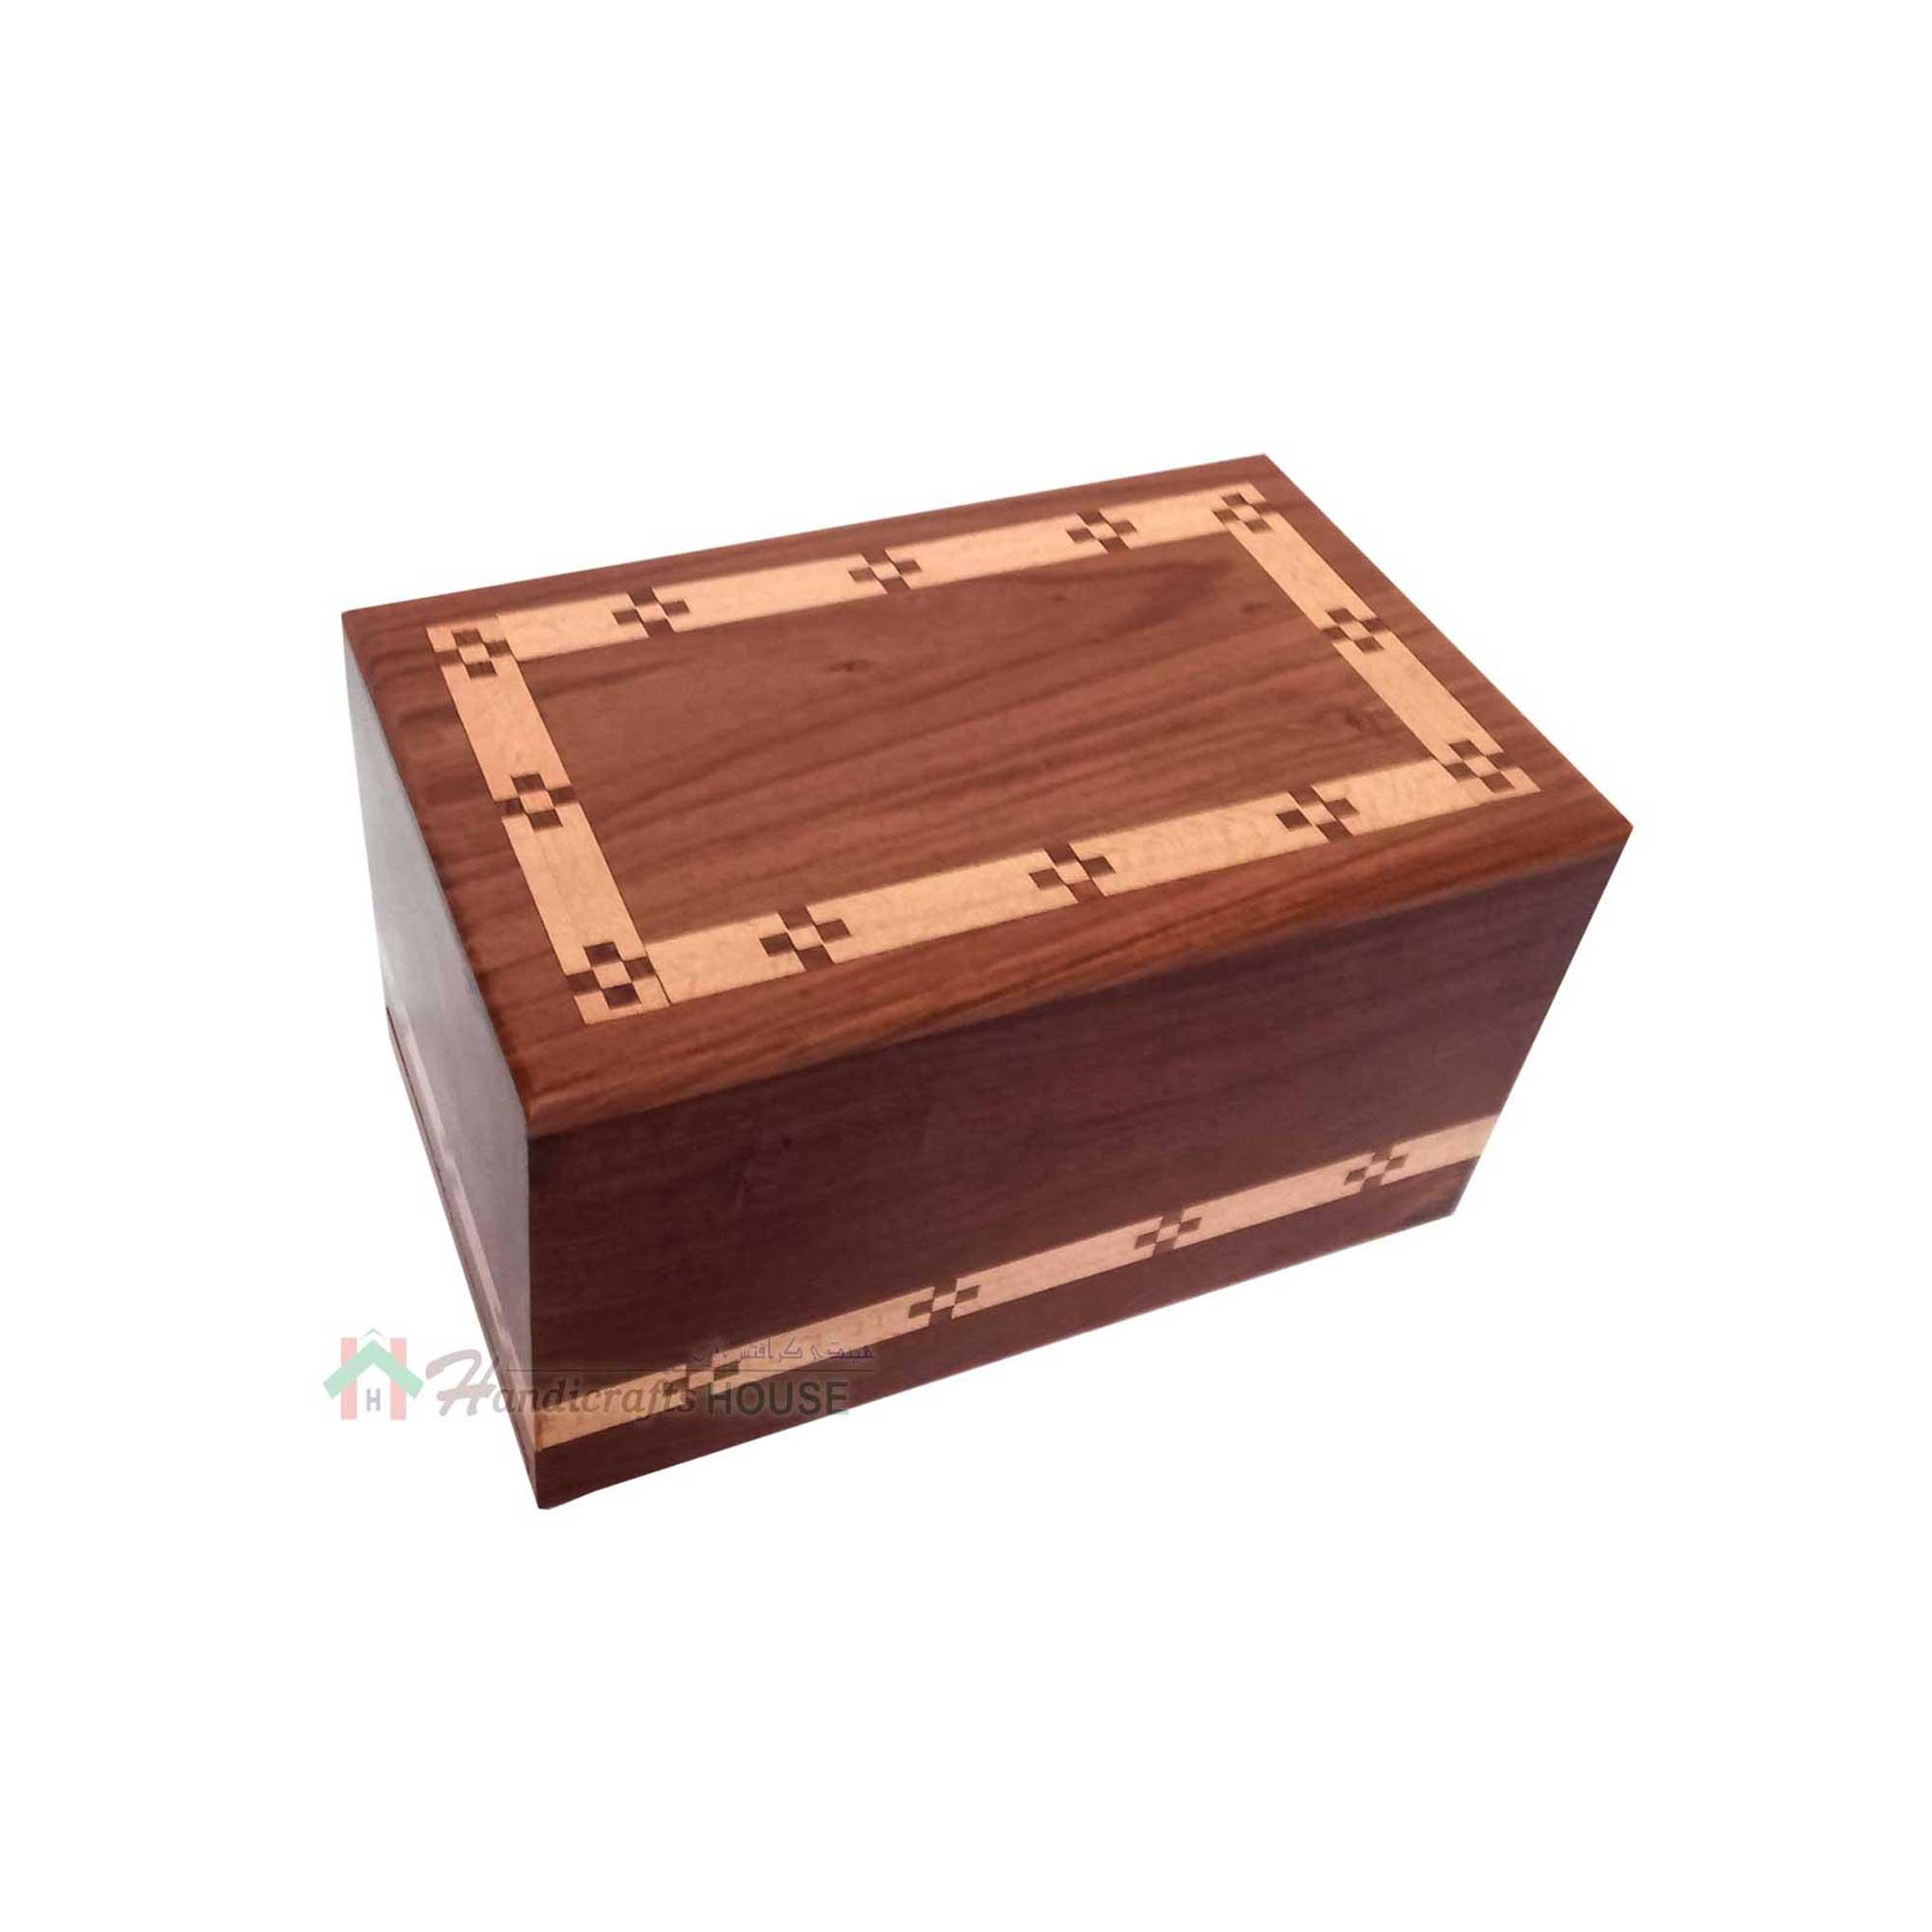 Human Ashes Urns, Funeral Casket, Wood Burial Box, Memorials Keepsake Urns For Adult